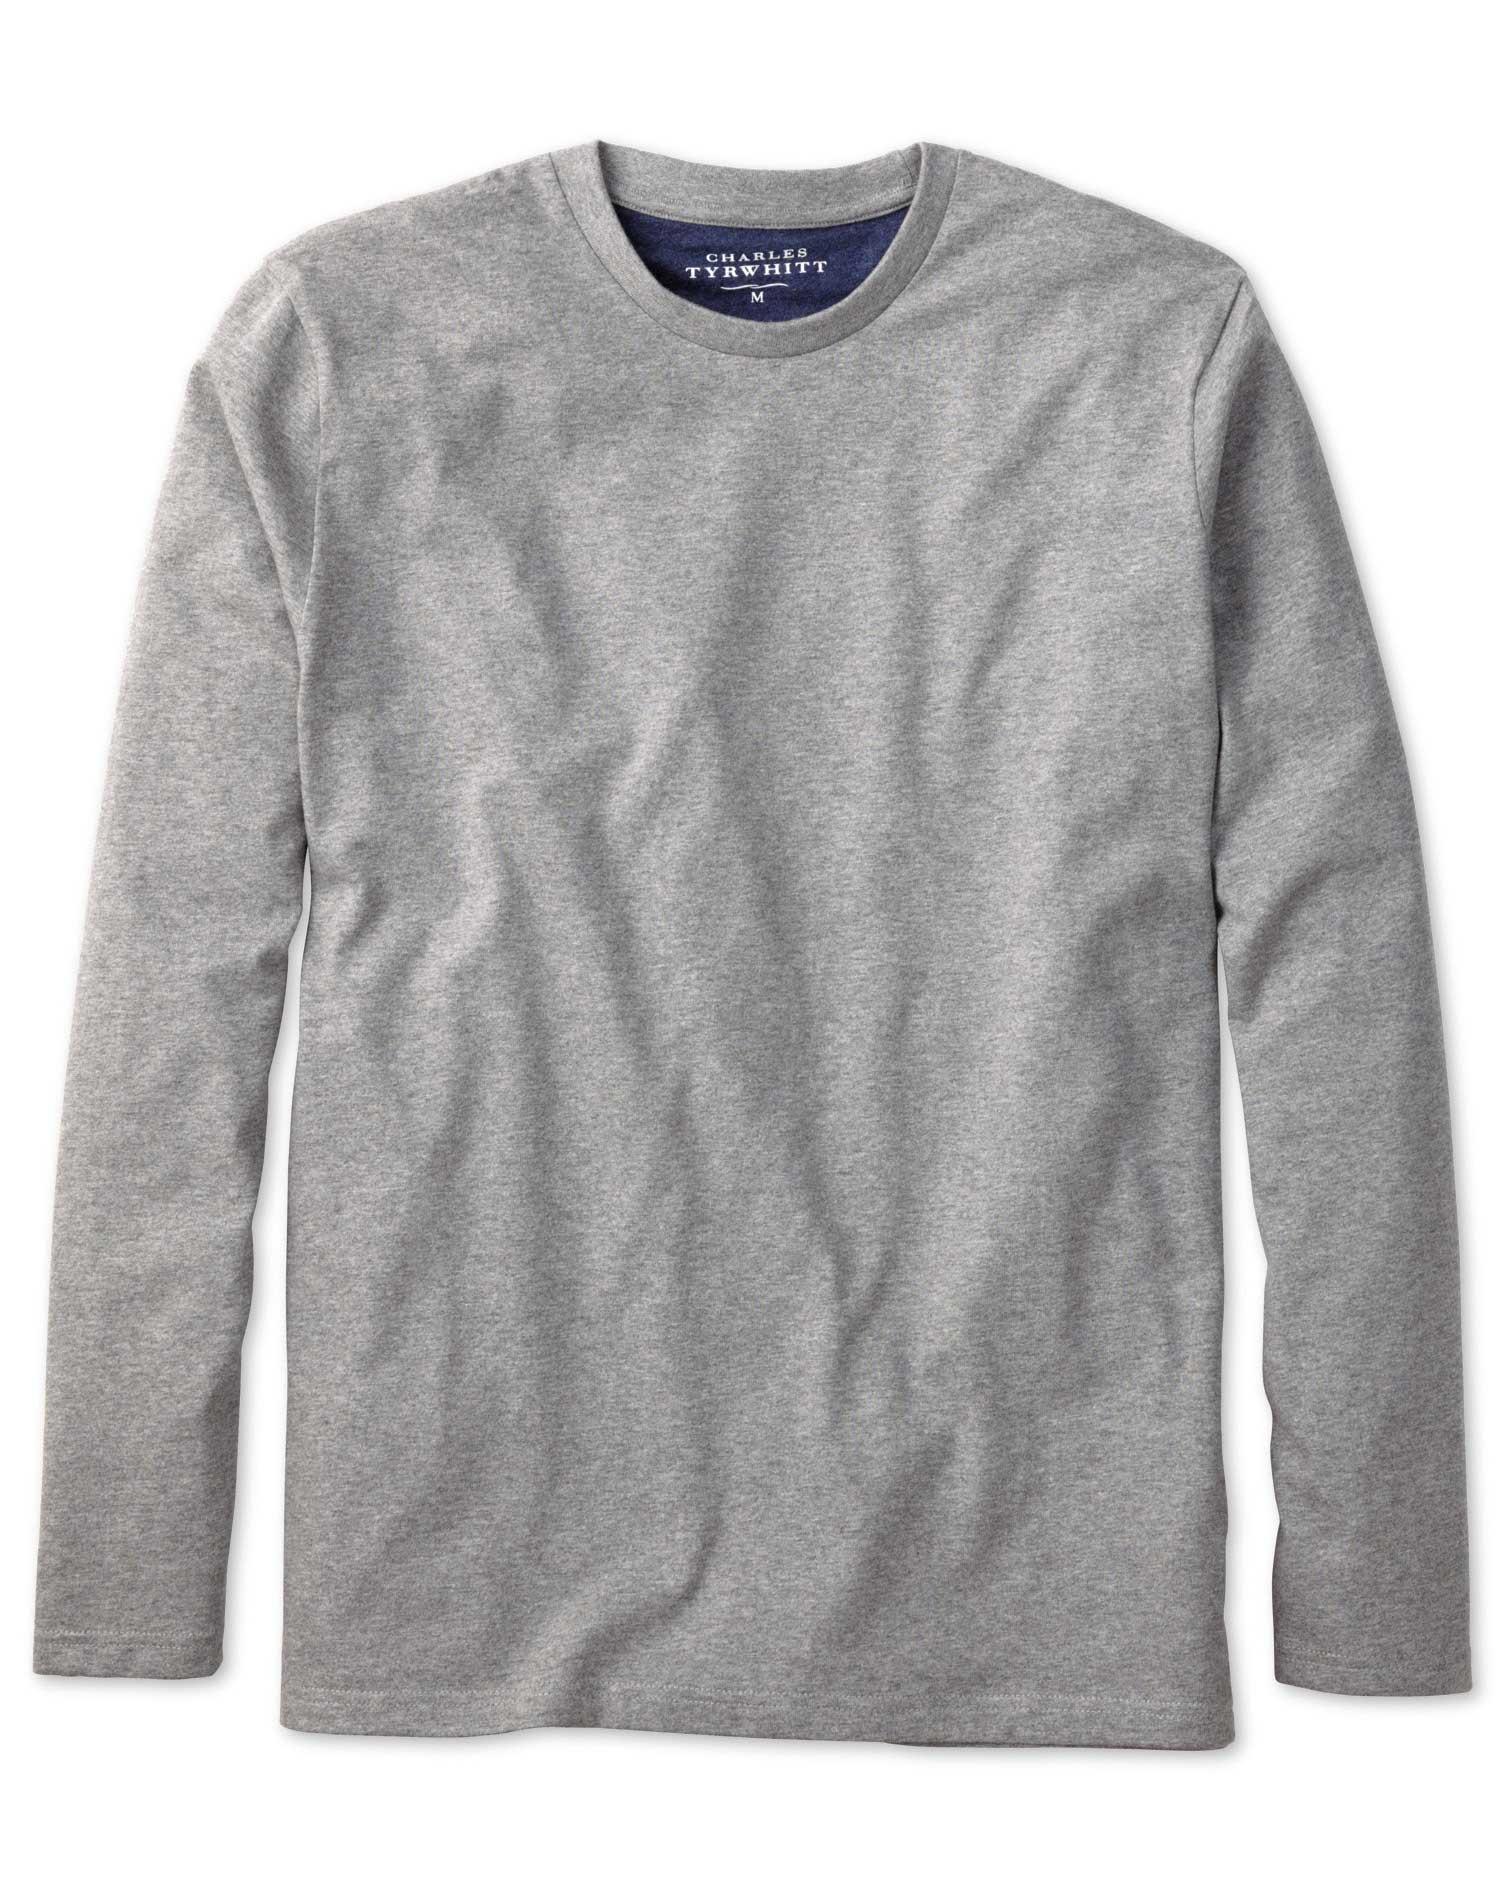 long sleeve t shirts grey cotton long sleeve t-shirt ZGSBBKN